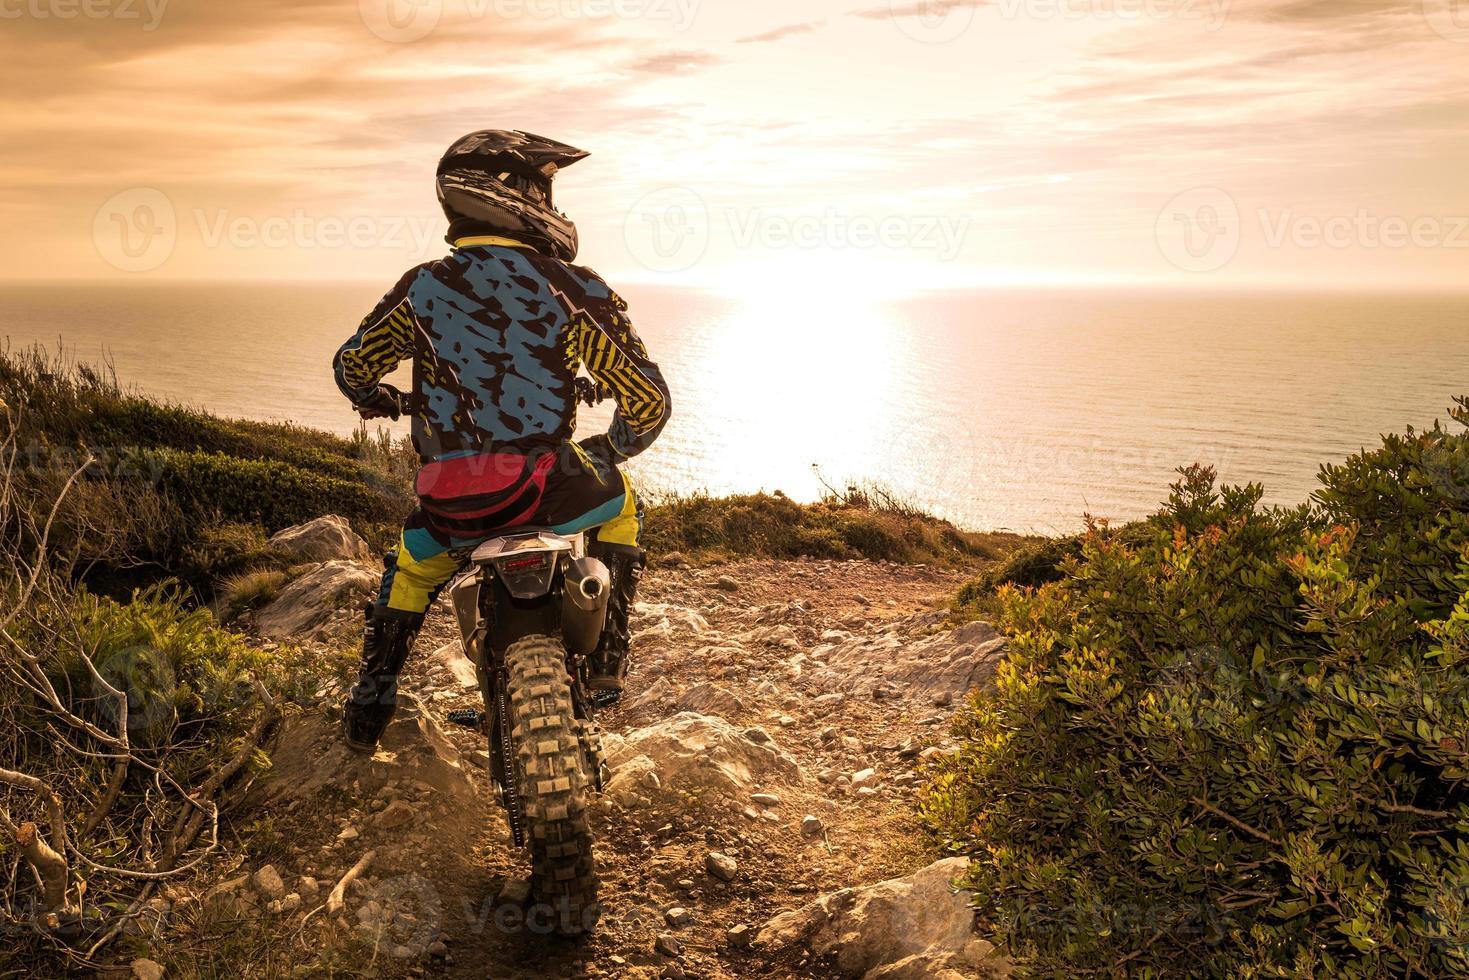 Enduro bike rider photo